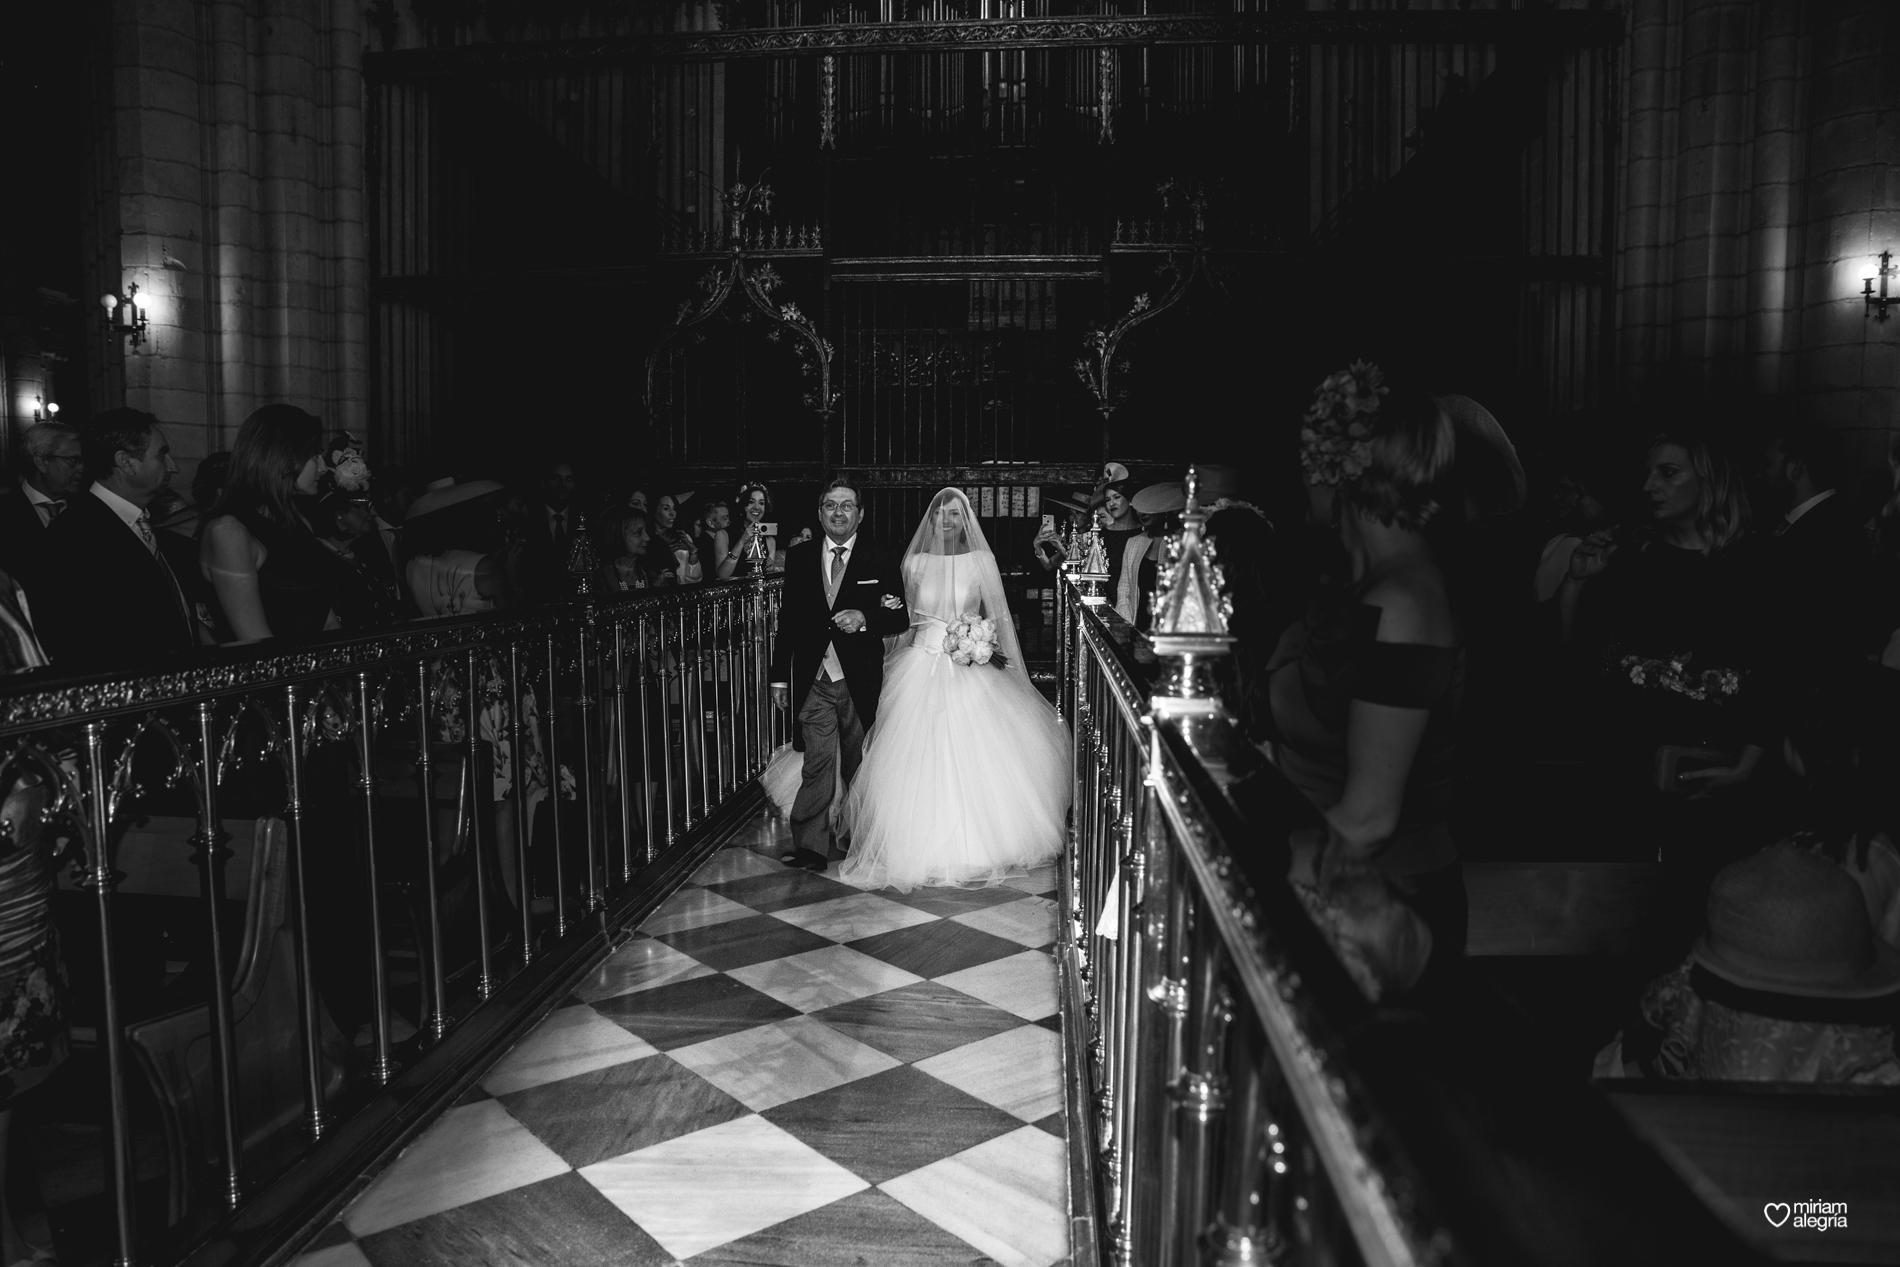 boda-en-la-catedral-de-murcia-miriam-alegria-fotografos-boda-murcia-35